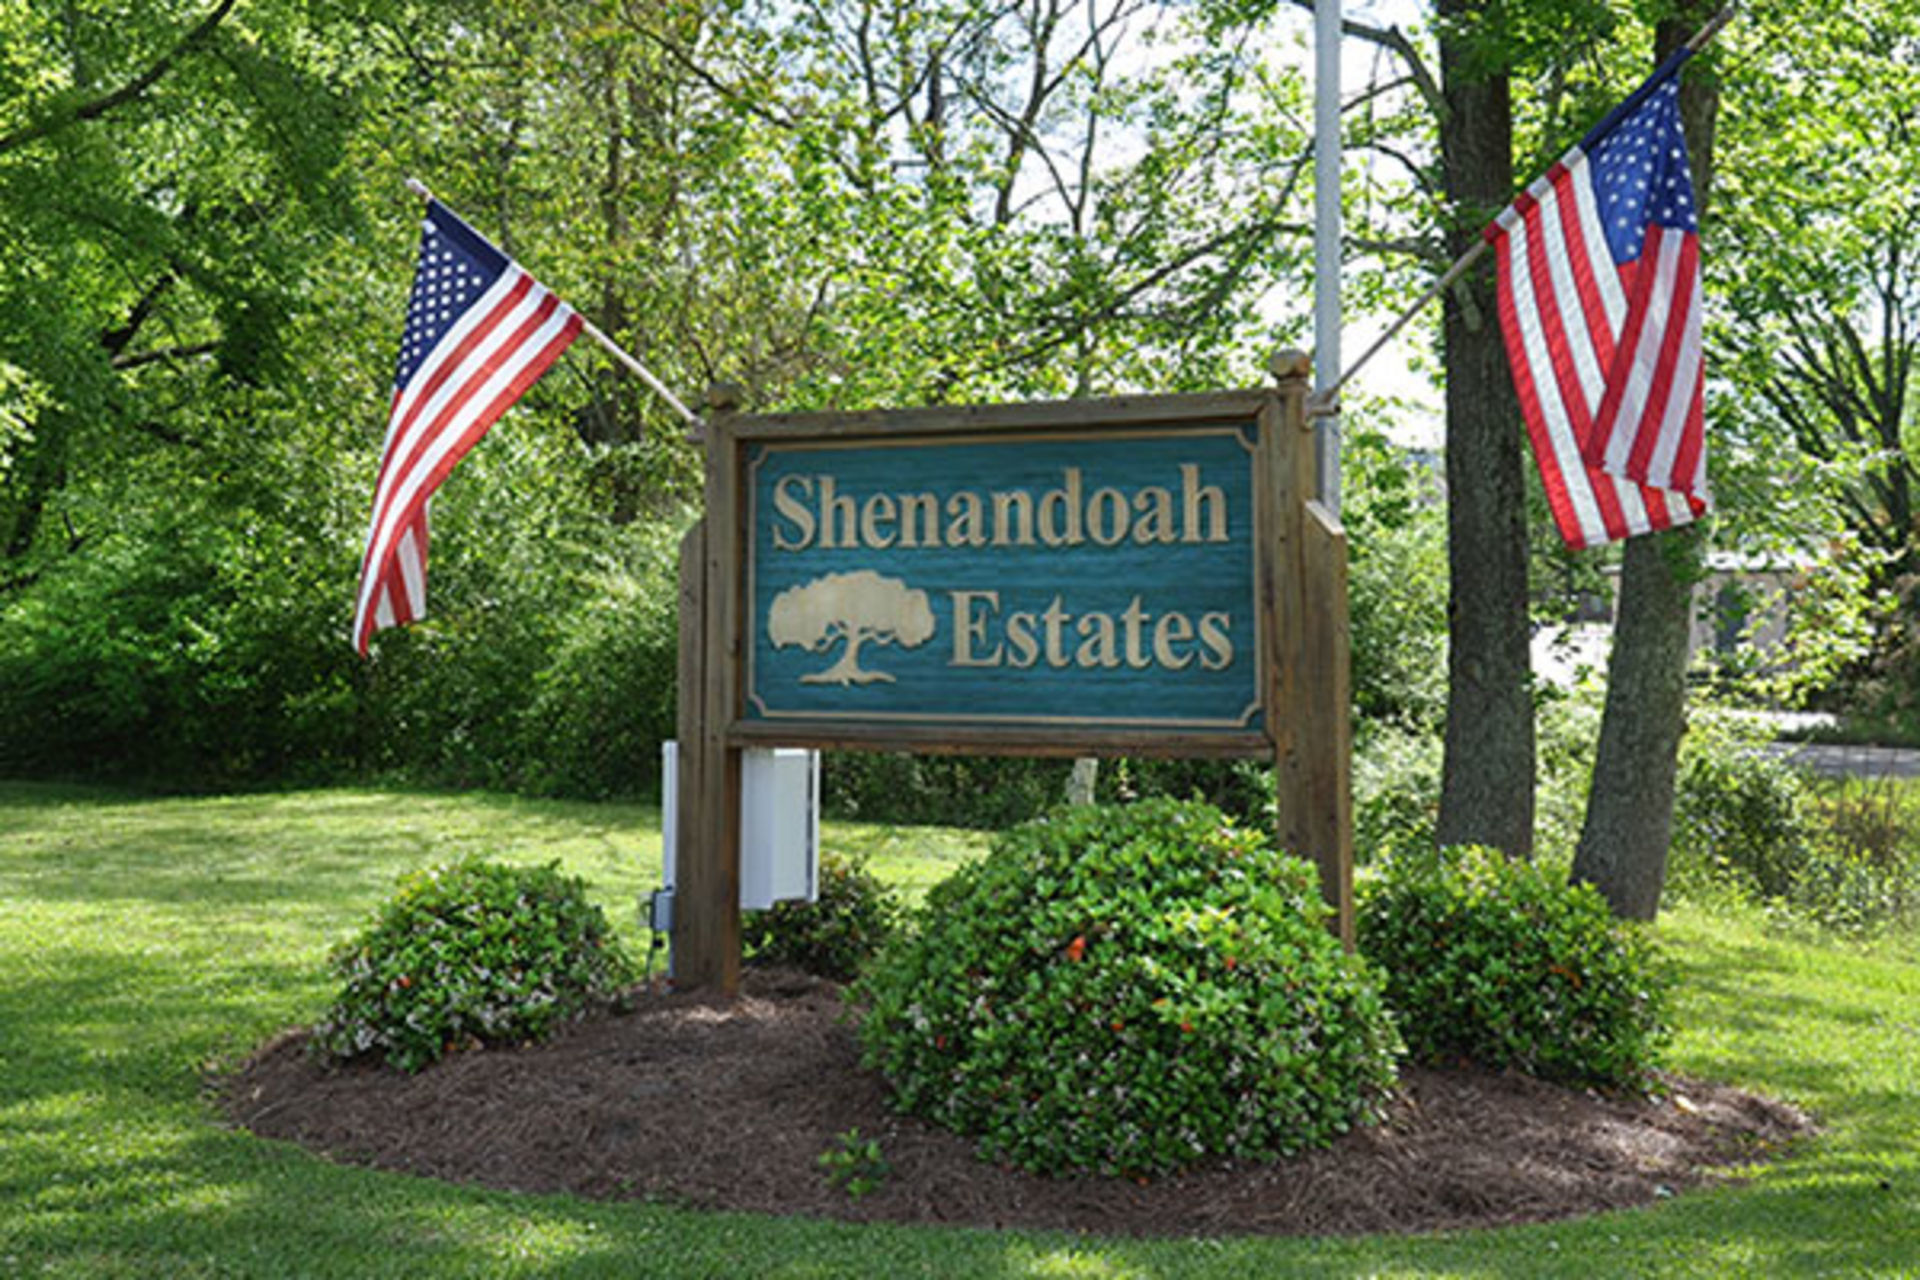 Shenandoah Estates Subdivision